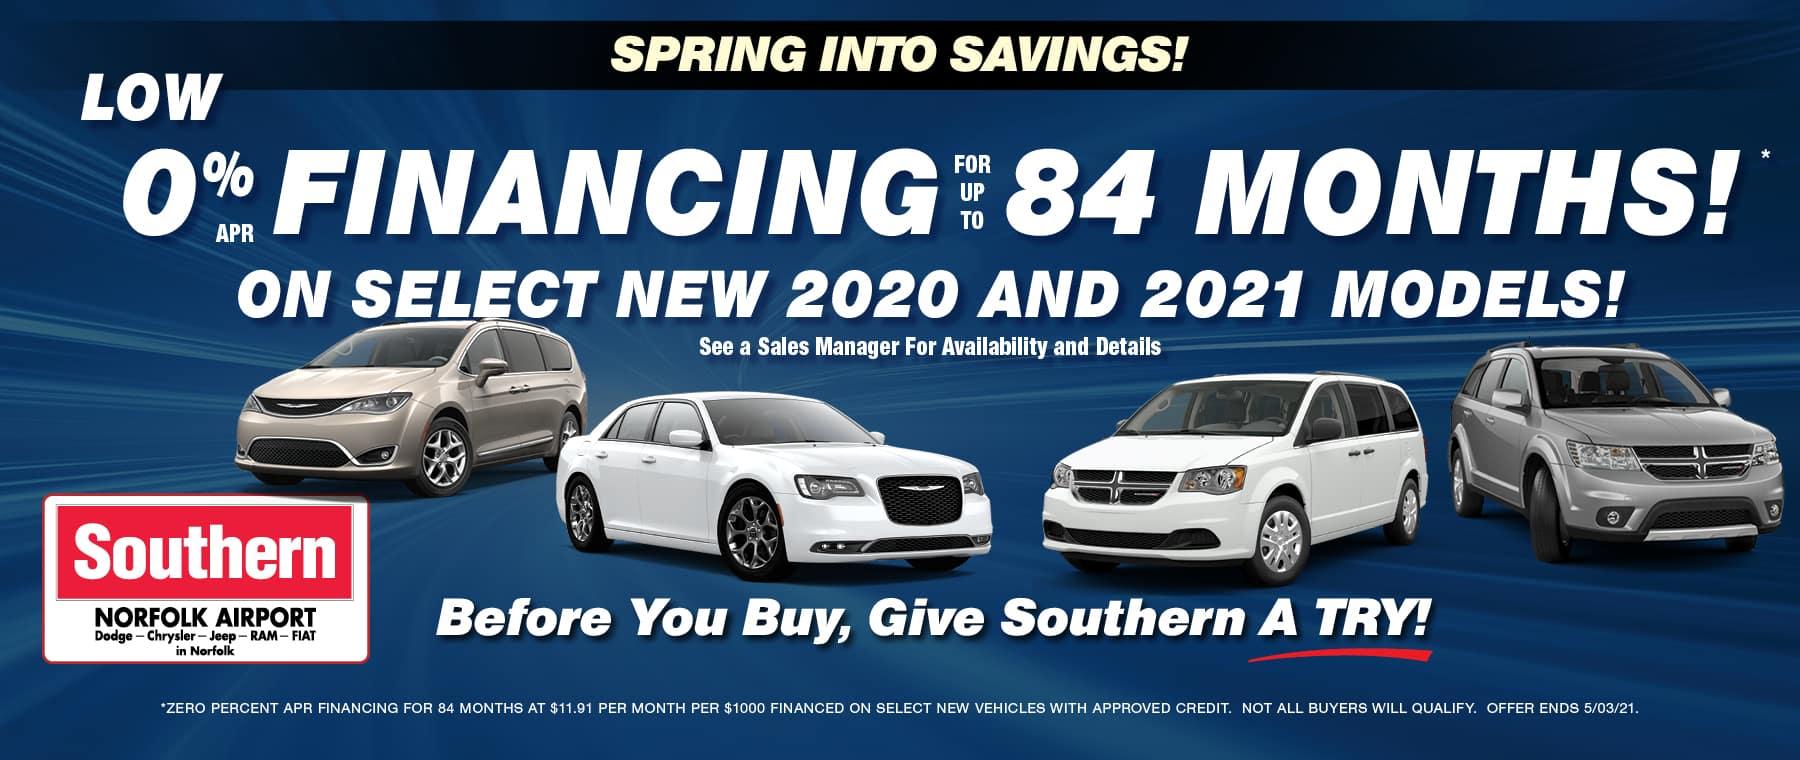 Southern Chrysler – Norfolk